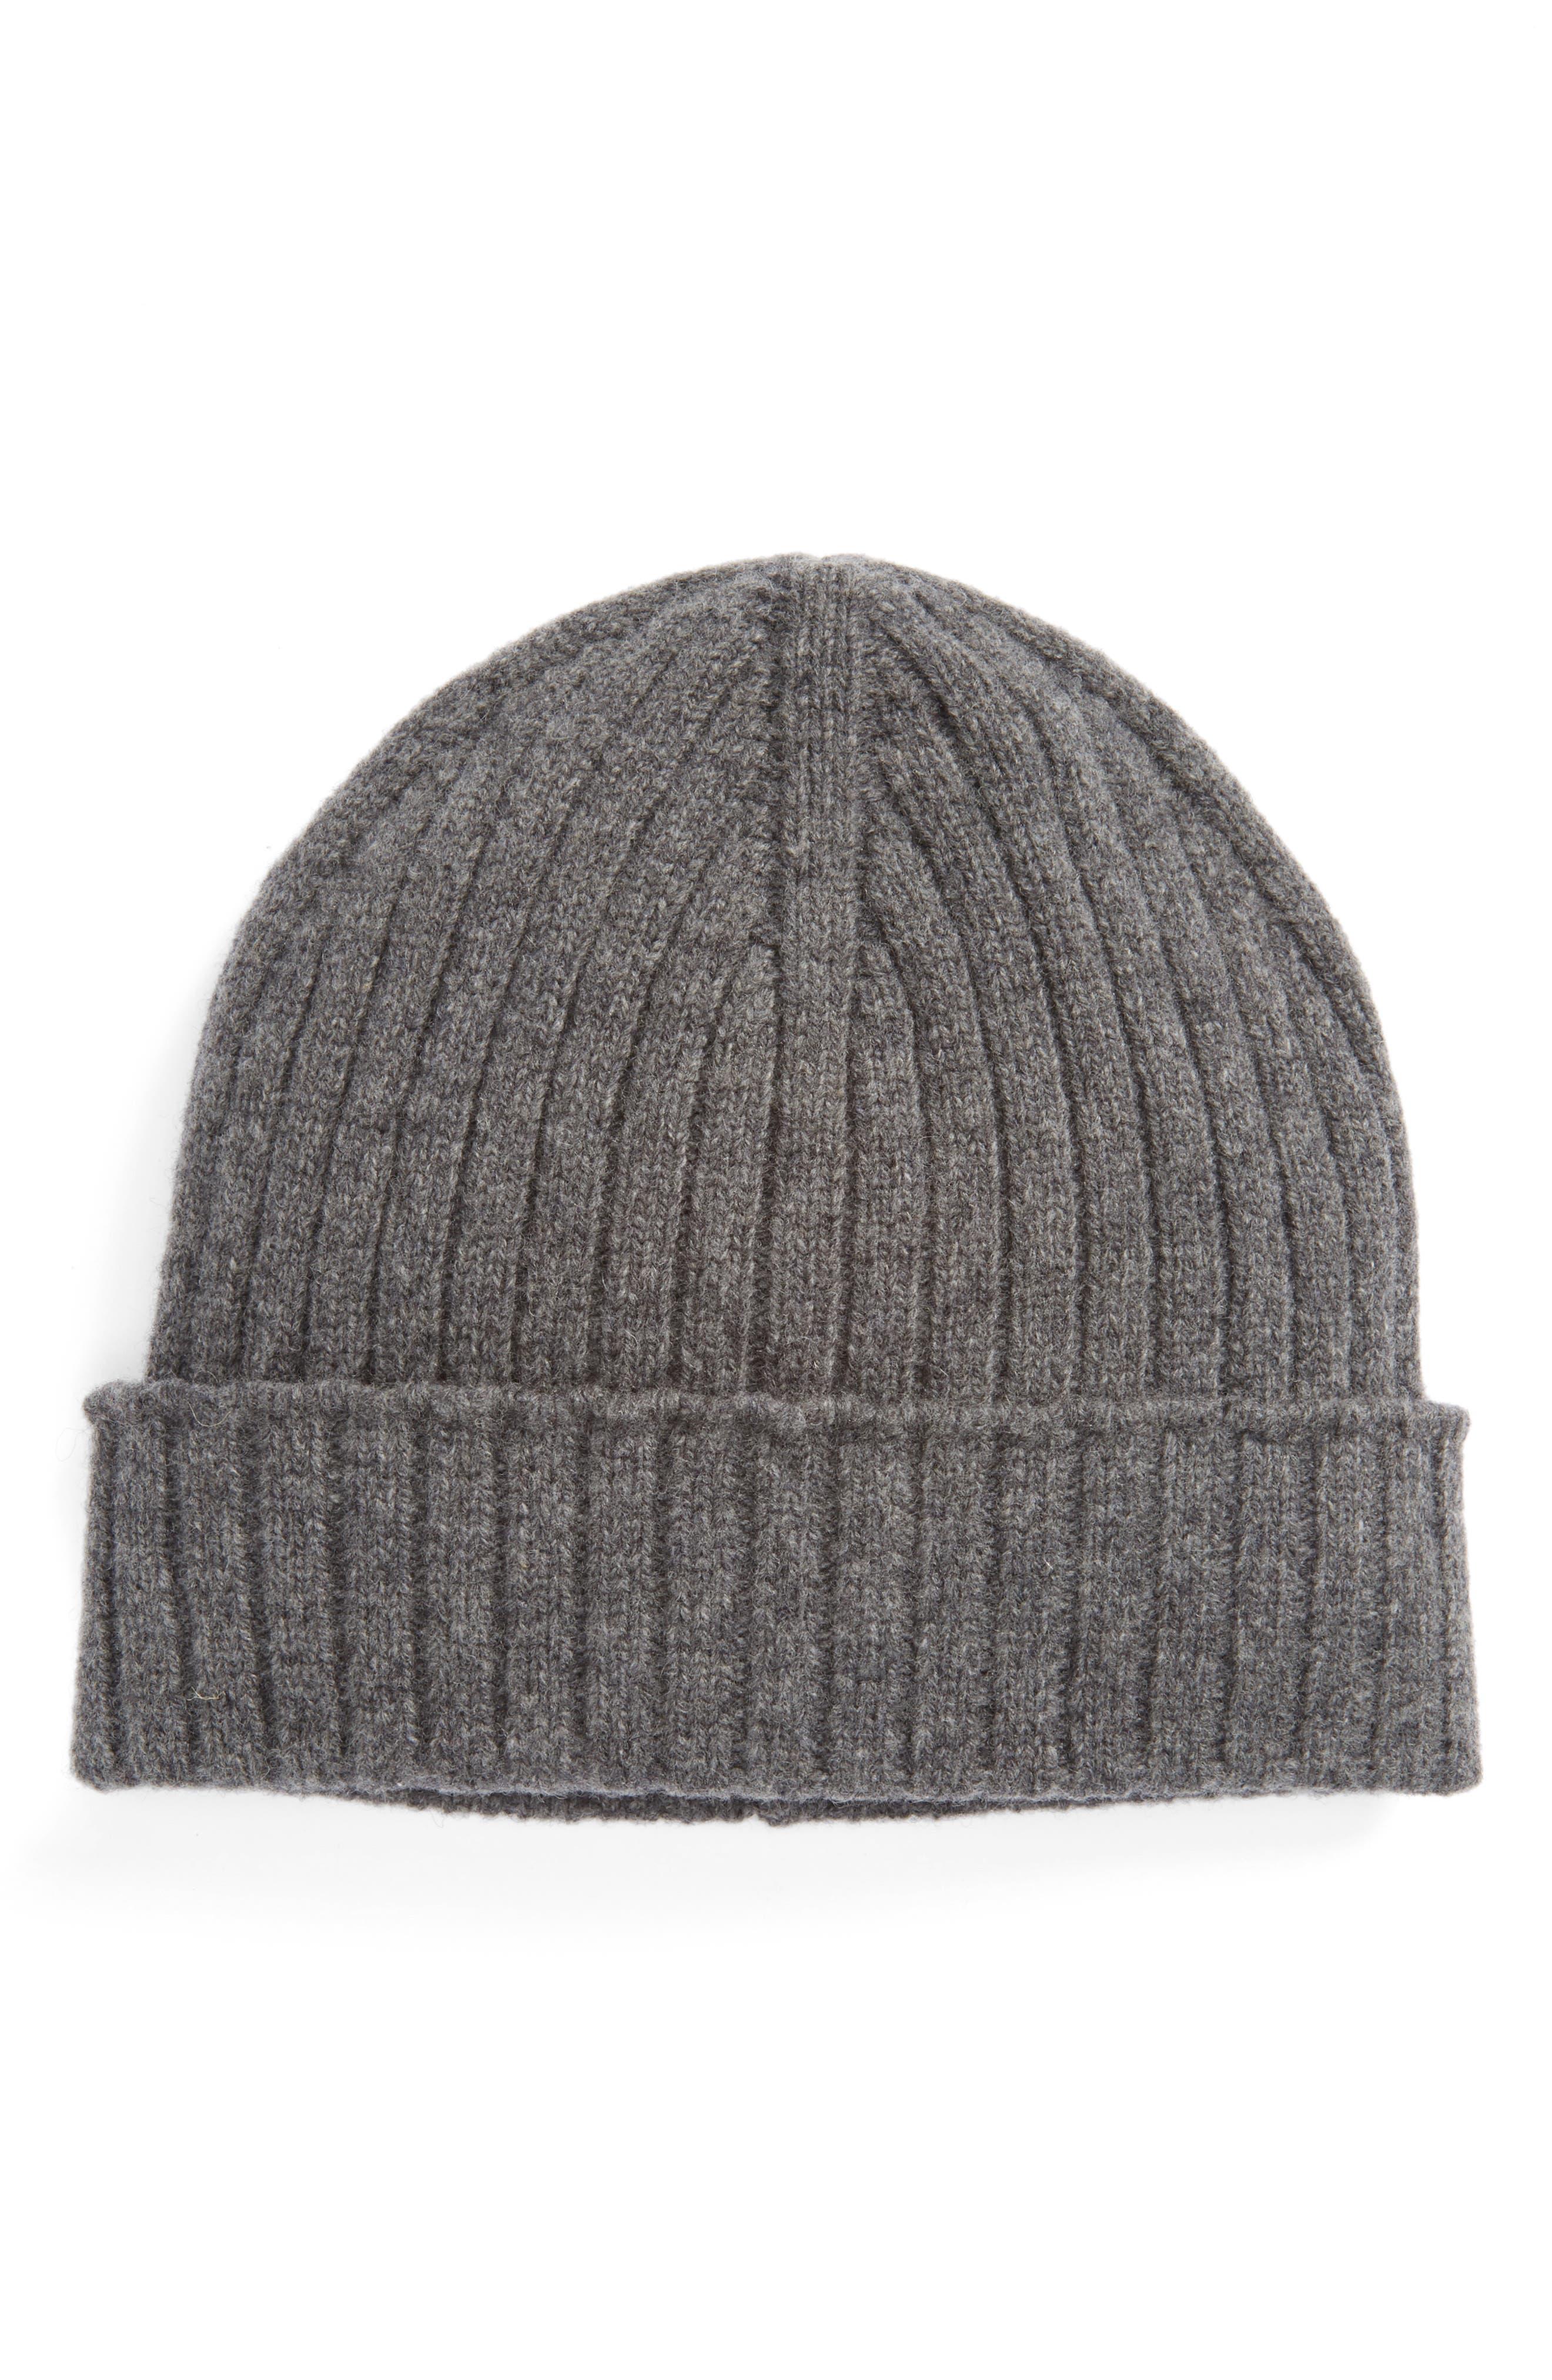 Wool Knit Cap,                         Main,                         color, 063